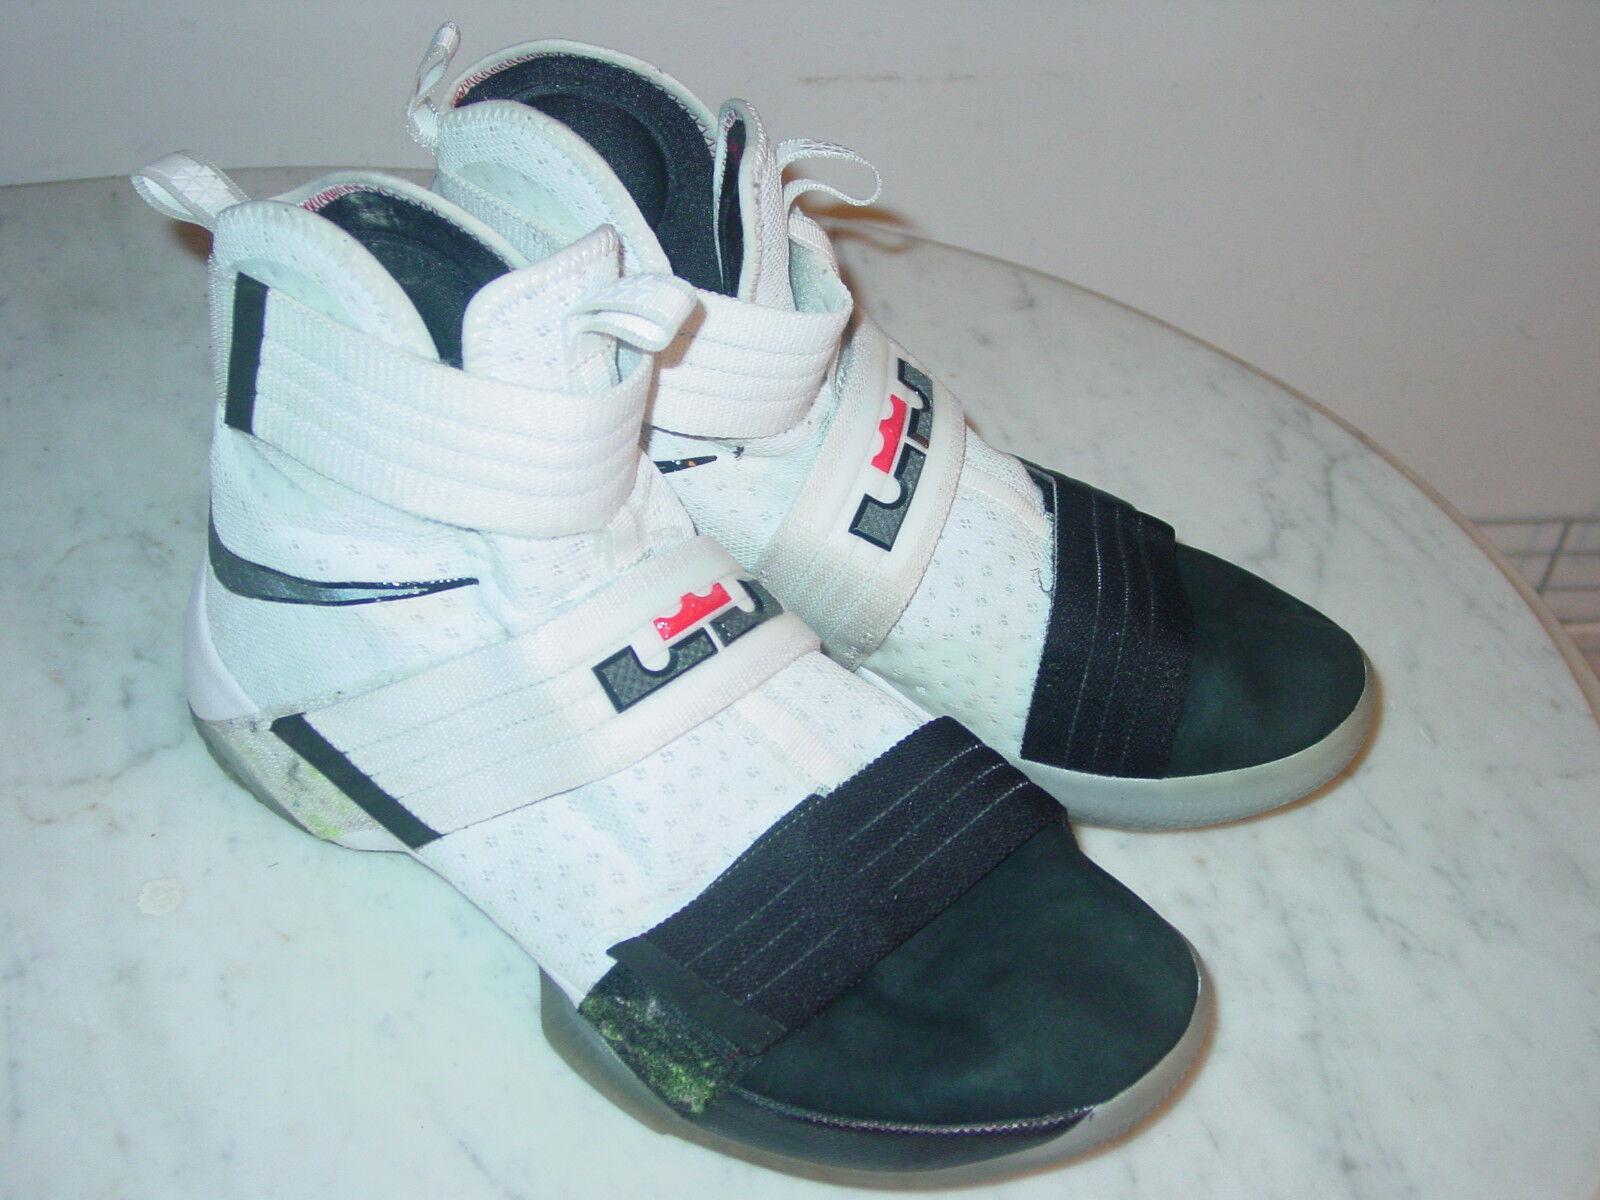 2016 Nike Lebron Soldier 10 SFG  Black Toe  White Black shoes  Size 10.5